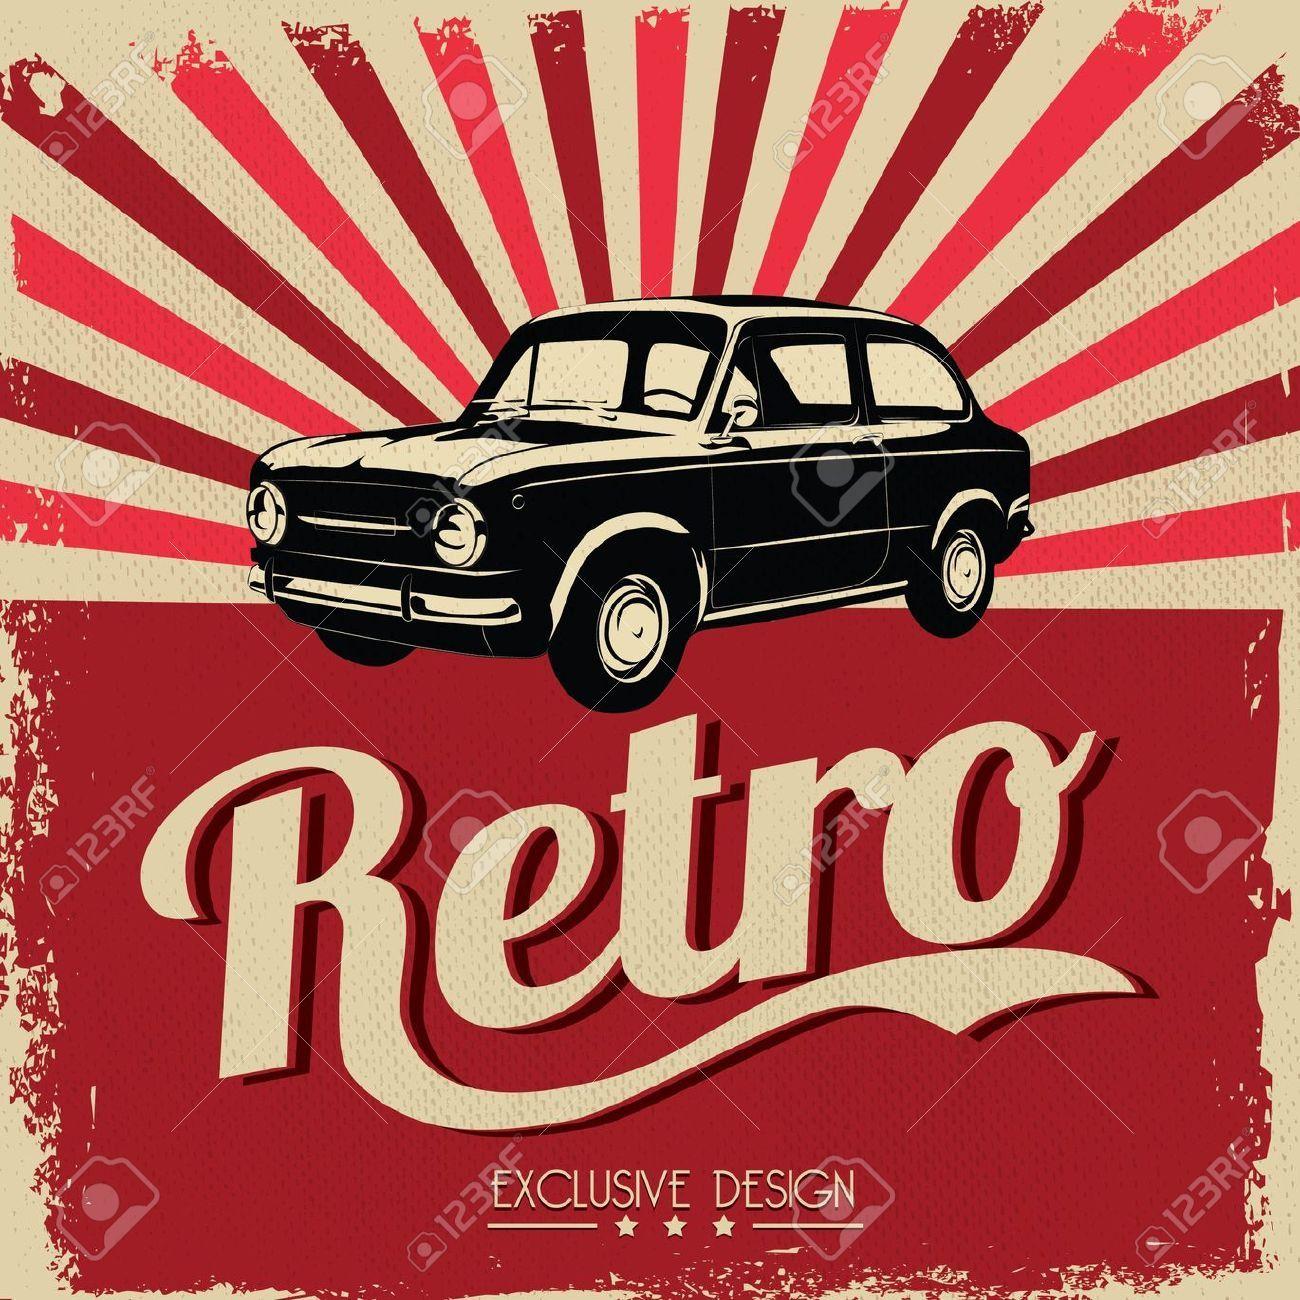 Vintage car signs clipart image royalty free download Stock Vector   vintage transportation   Flyer design ... image royalty free download